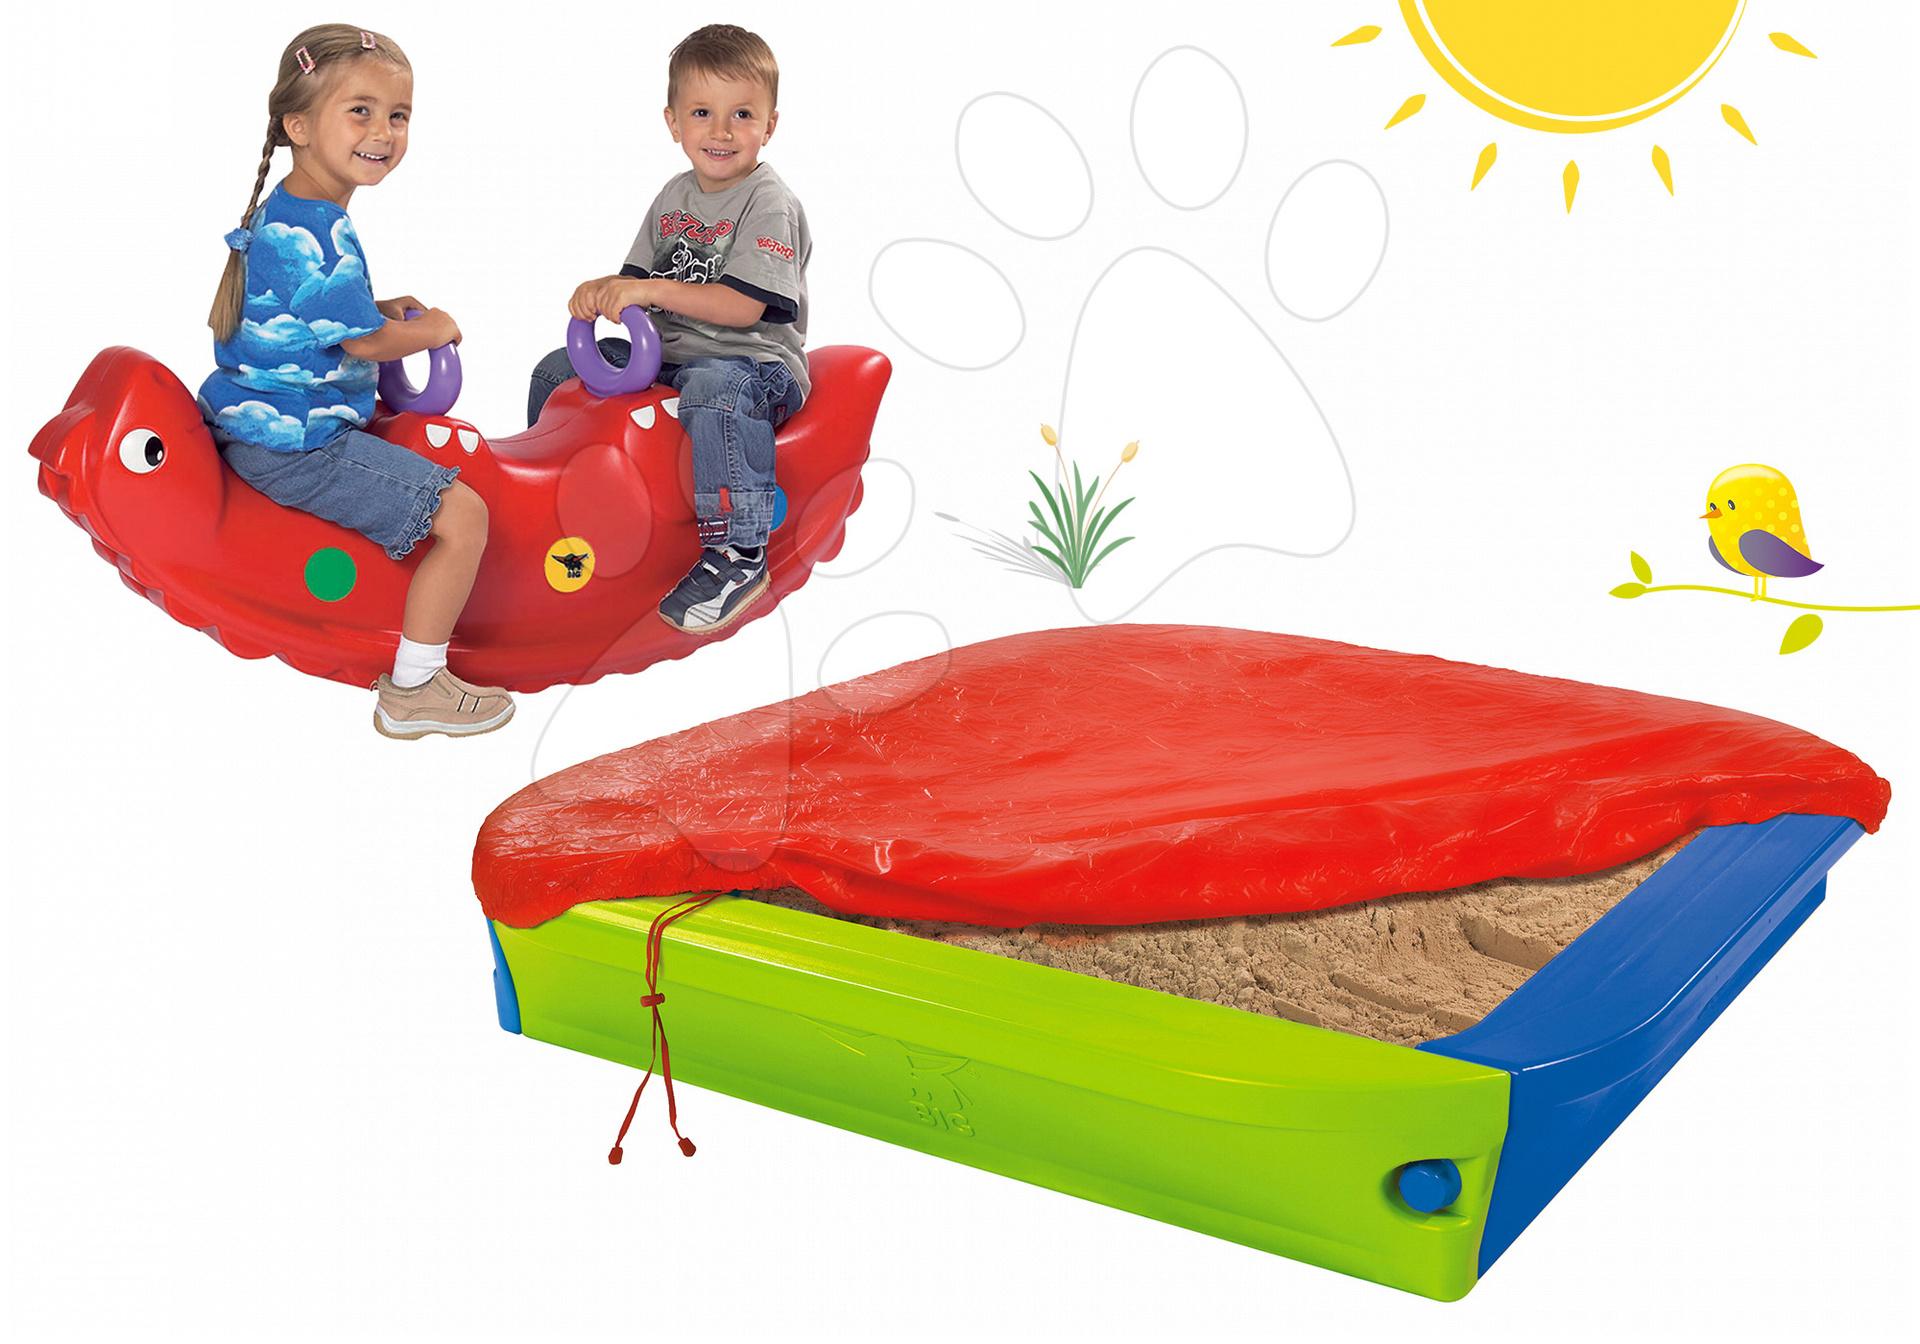 BIG set detské pieskovisko a hojdačka dinosaurus Sammy 56726-1